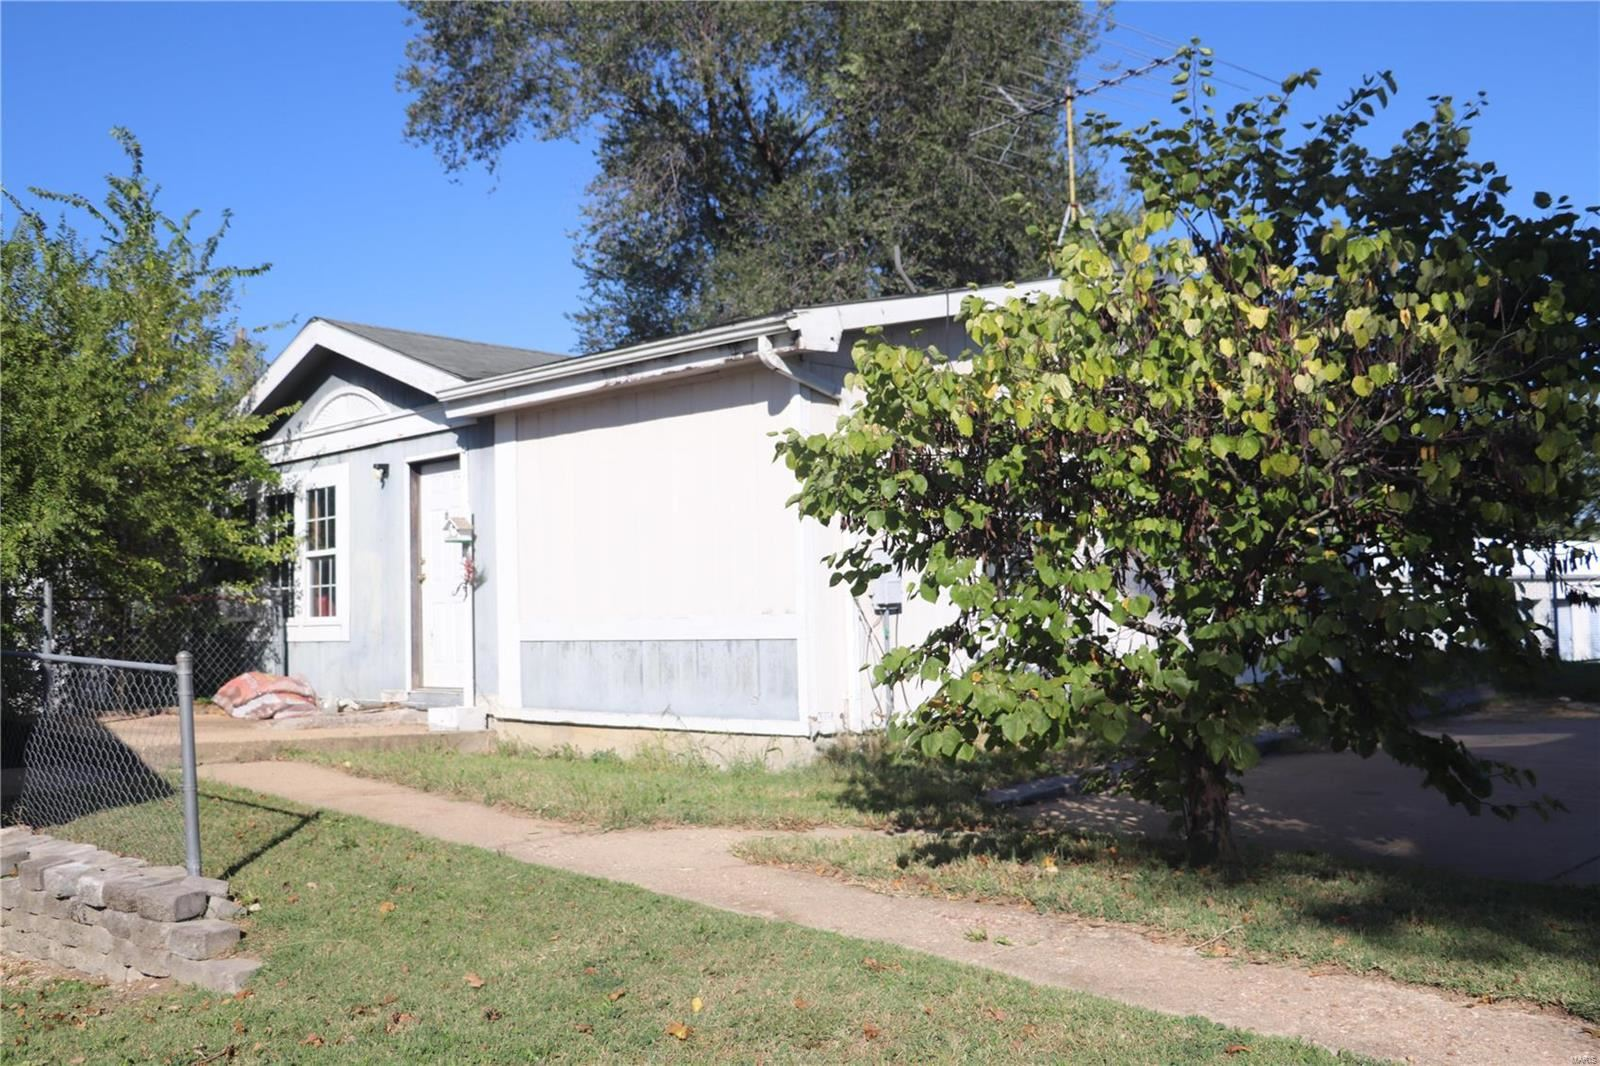 425 Baum, Pevely, MO 63070 - MLS#: 21073030